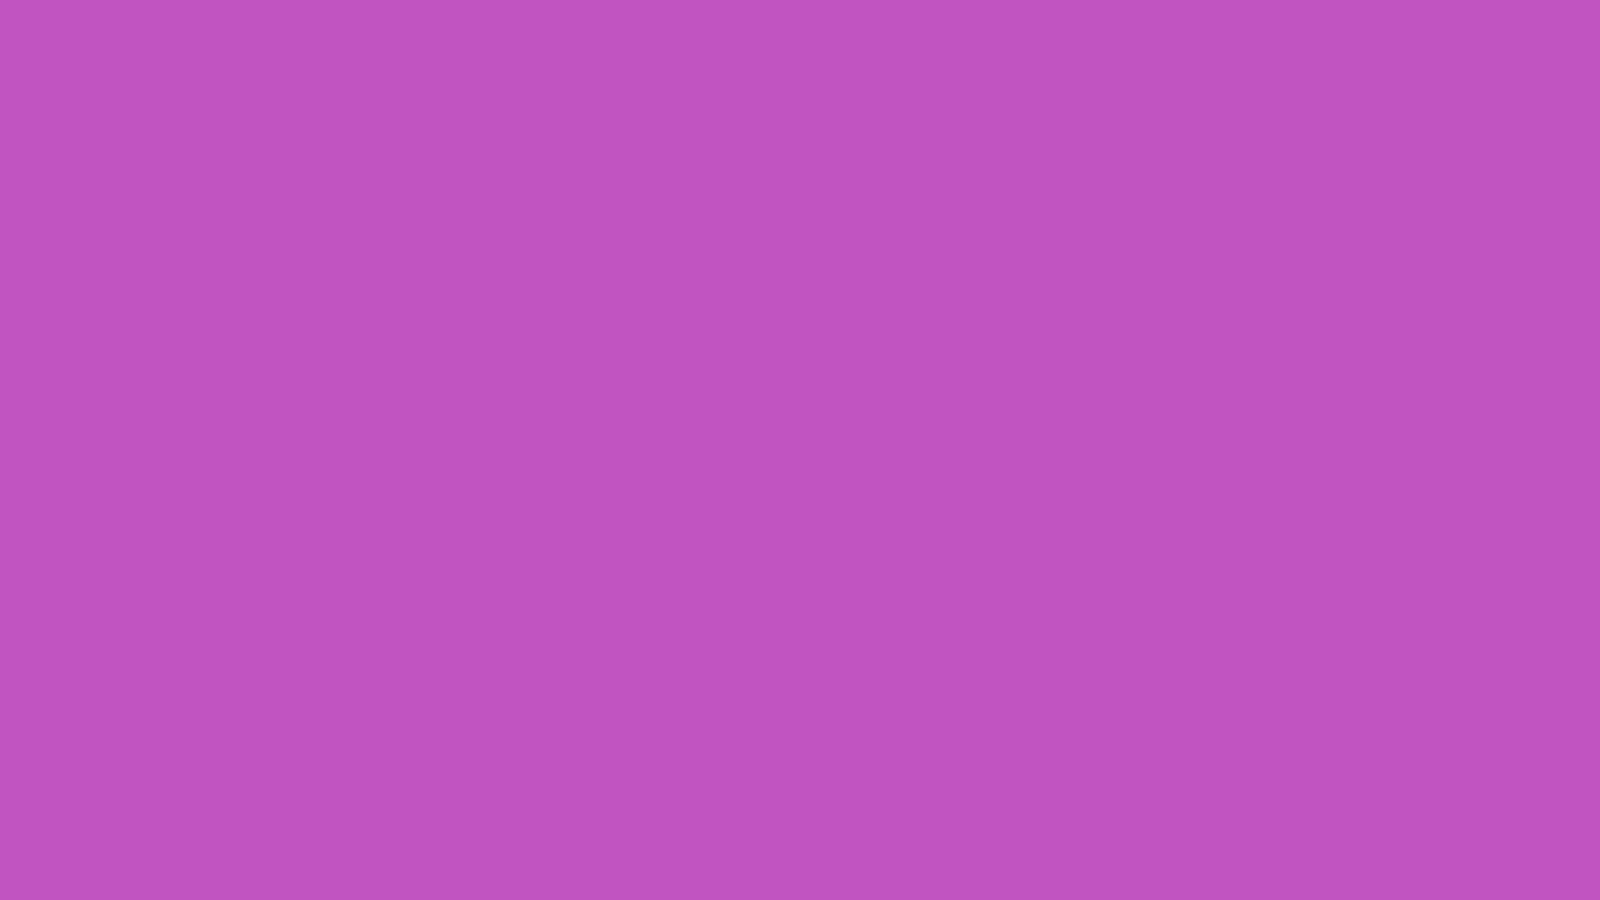 1600x900 Fuchsia Crayola Solid Color Background